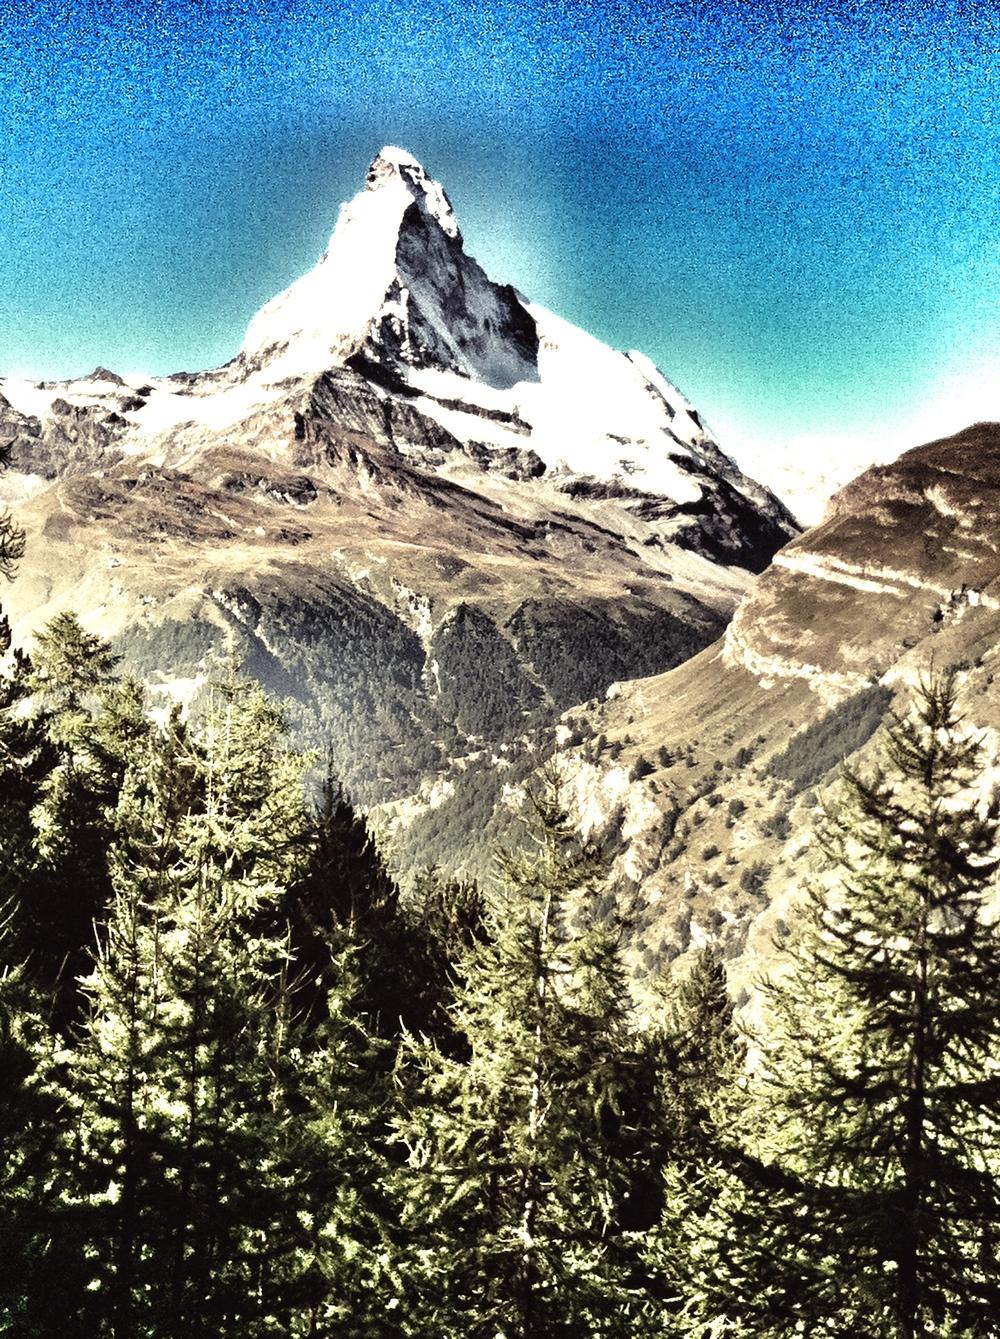 The Matterhorn, Switzerland. A couple of years ago.